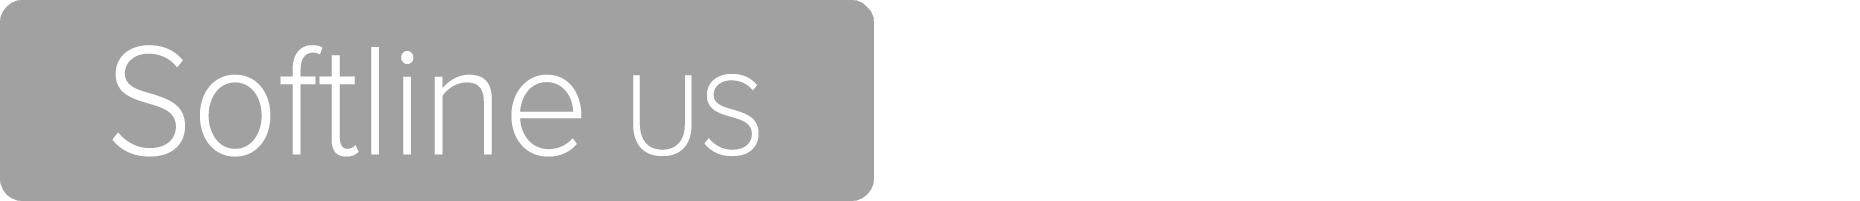 01_Sublime-Windows_NAME_SoftlineUS.jpg